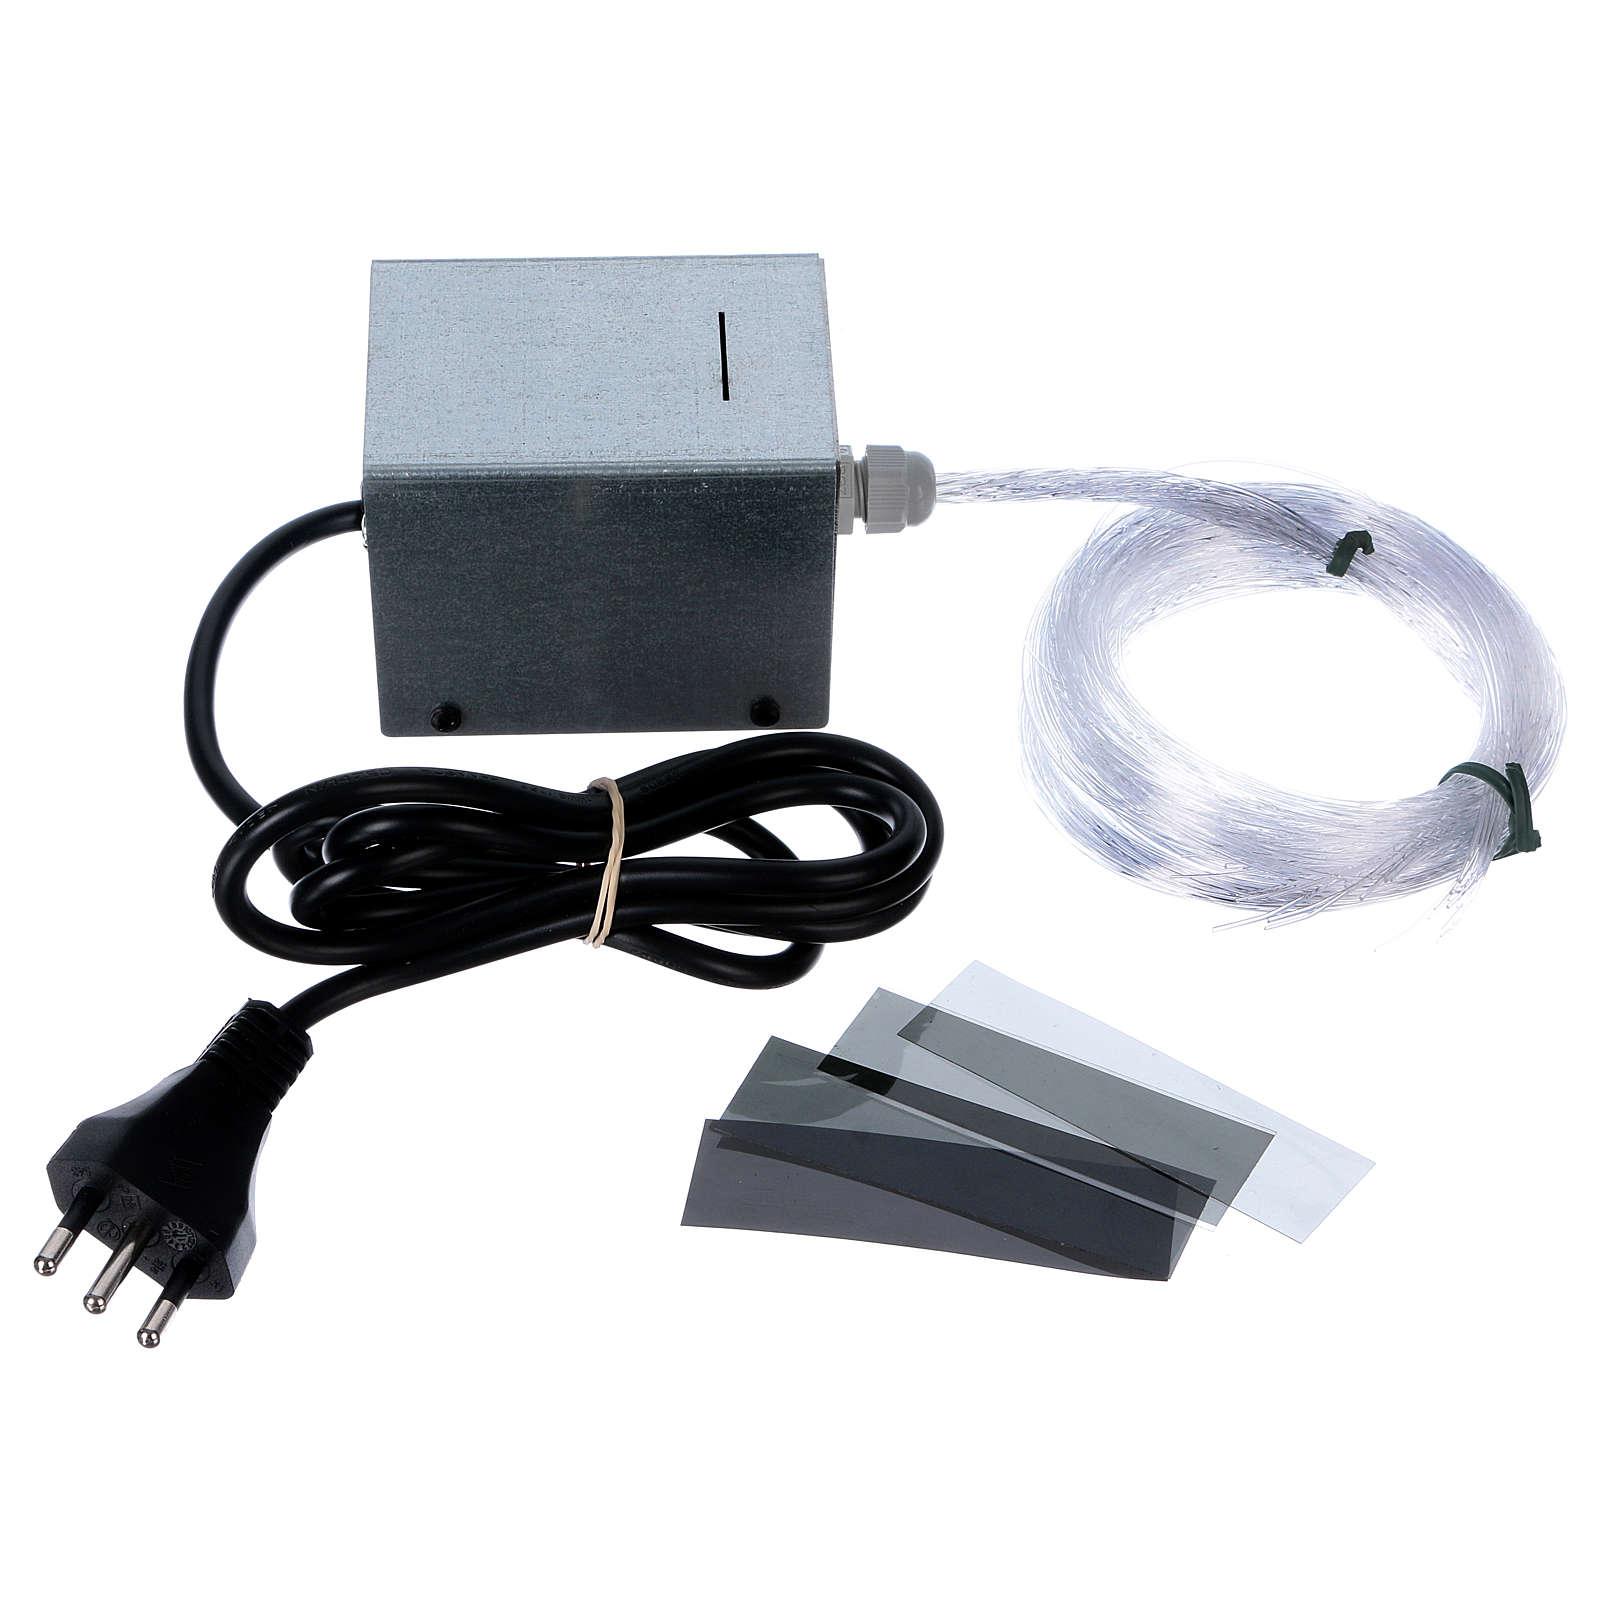 Control Unit for fiber optic stars Light Filter 50 assorted threads for Nativity scene 4